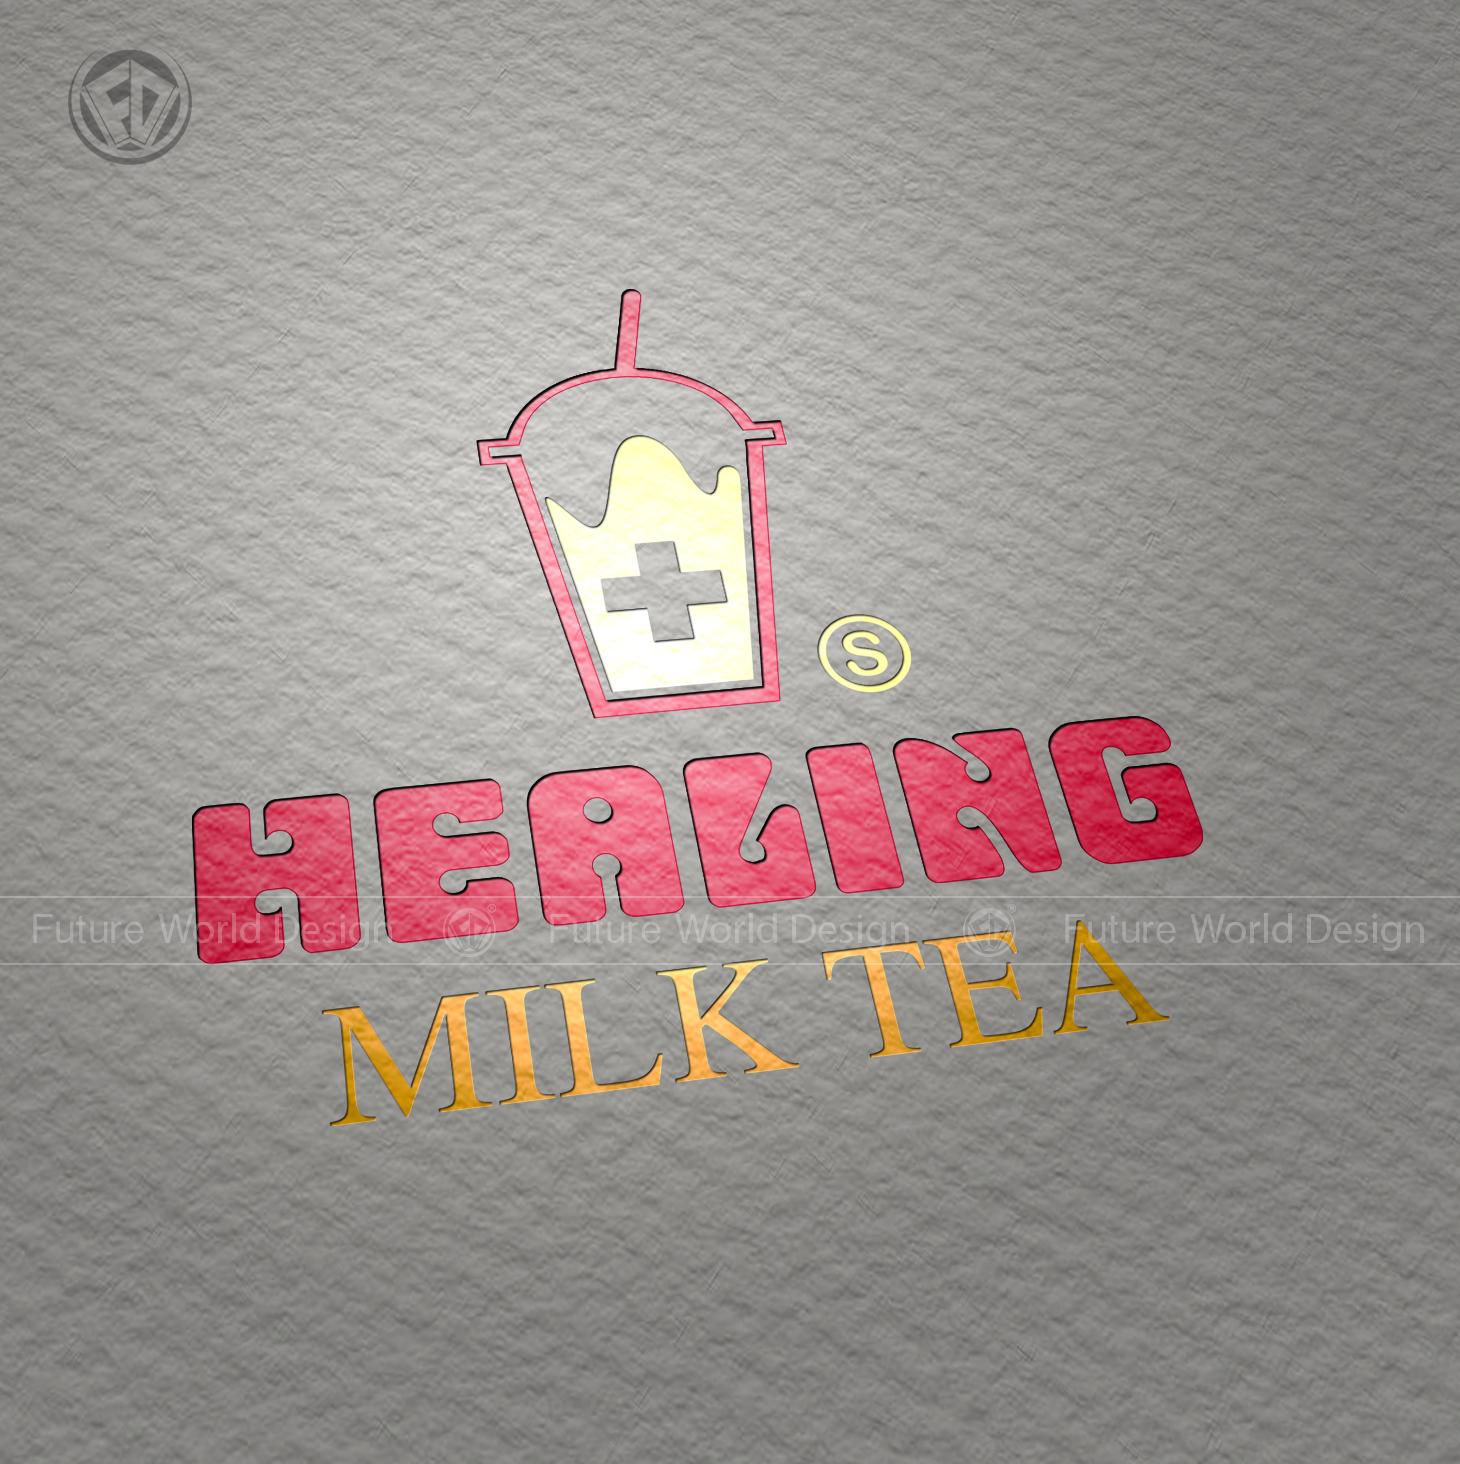 Healing Milk Tea - Logo Thiết Kế TPHCM